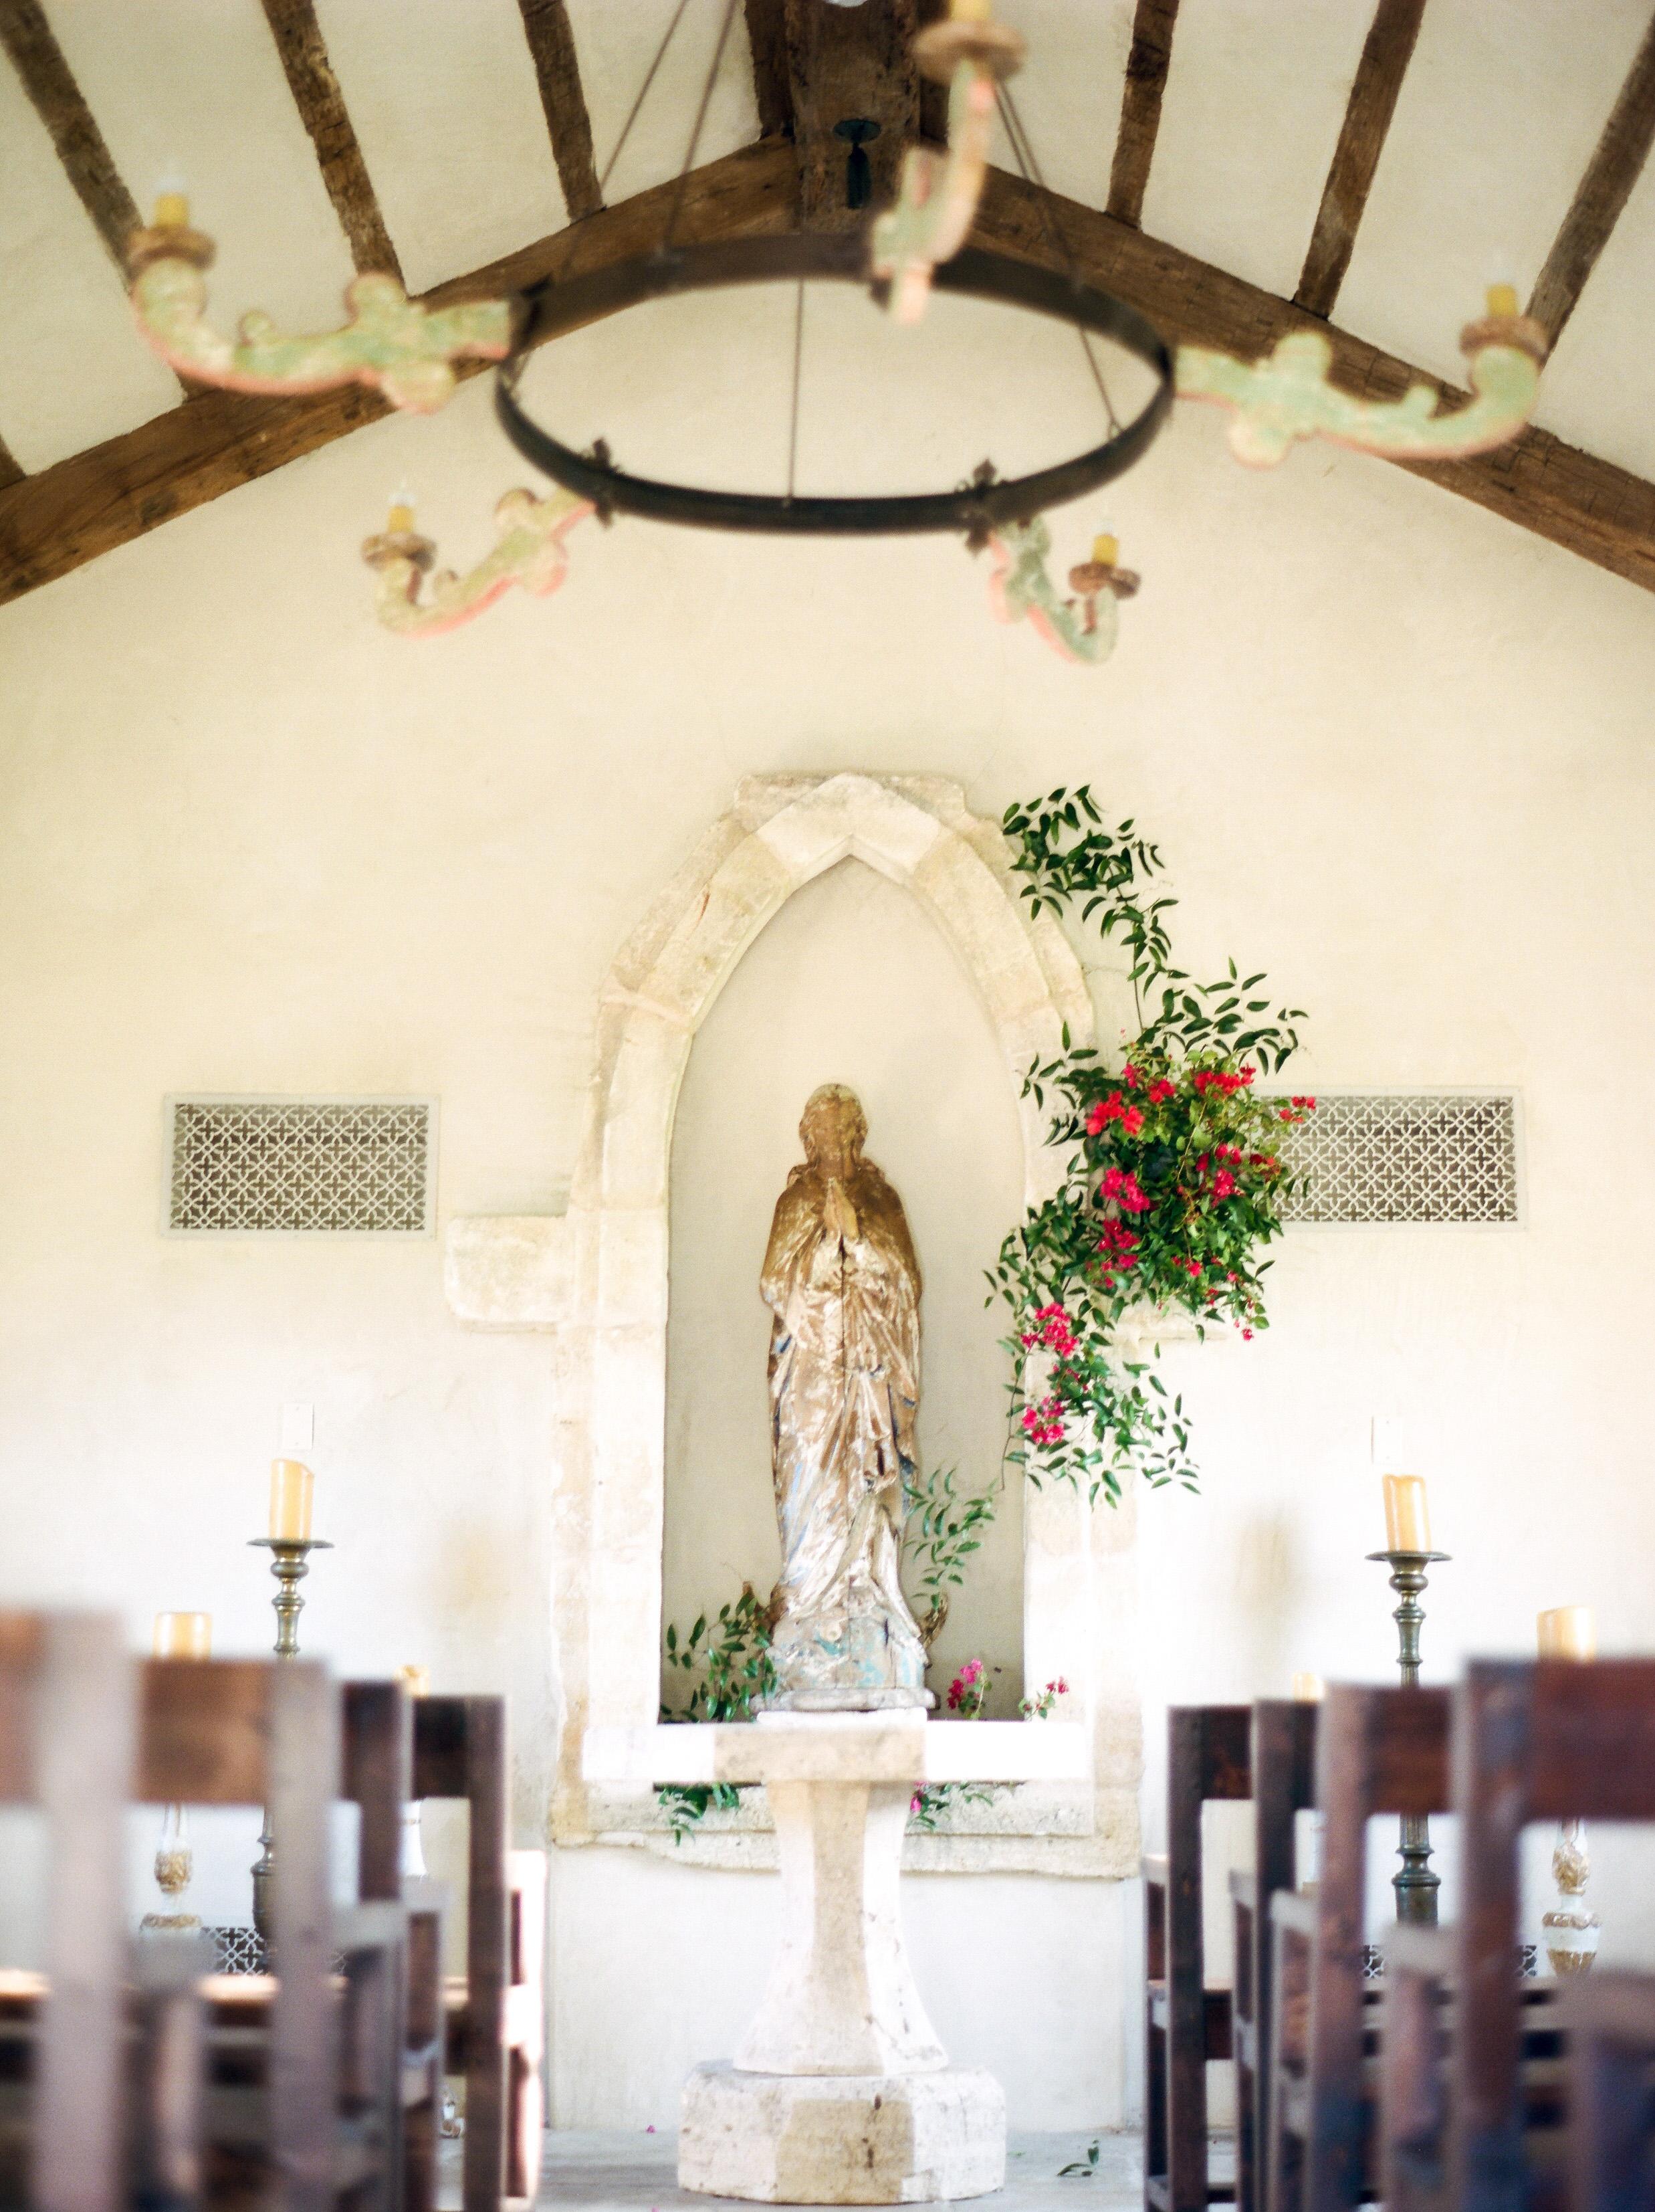 Top-Houston-Wedding-Photographer-Dana-Fernandez-Photography-The-Clubs-At-Houston-Oaks-Country-Club-Belle-Events-Film-Fine-Art-Destination-17.jpg